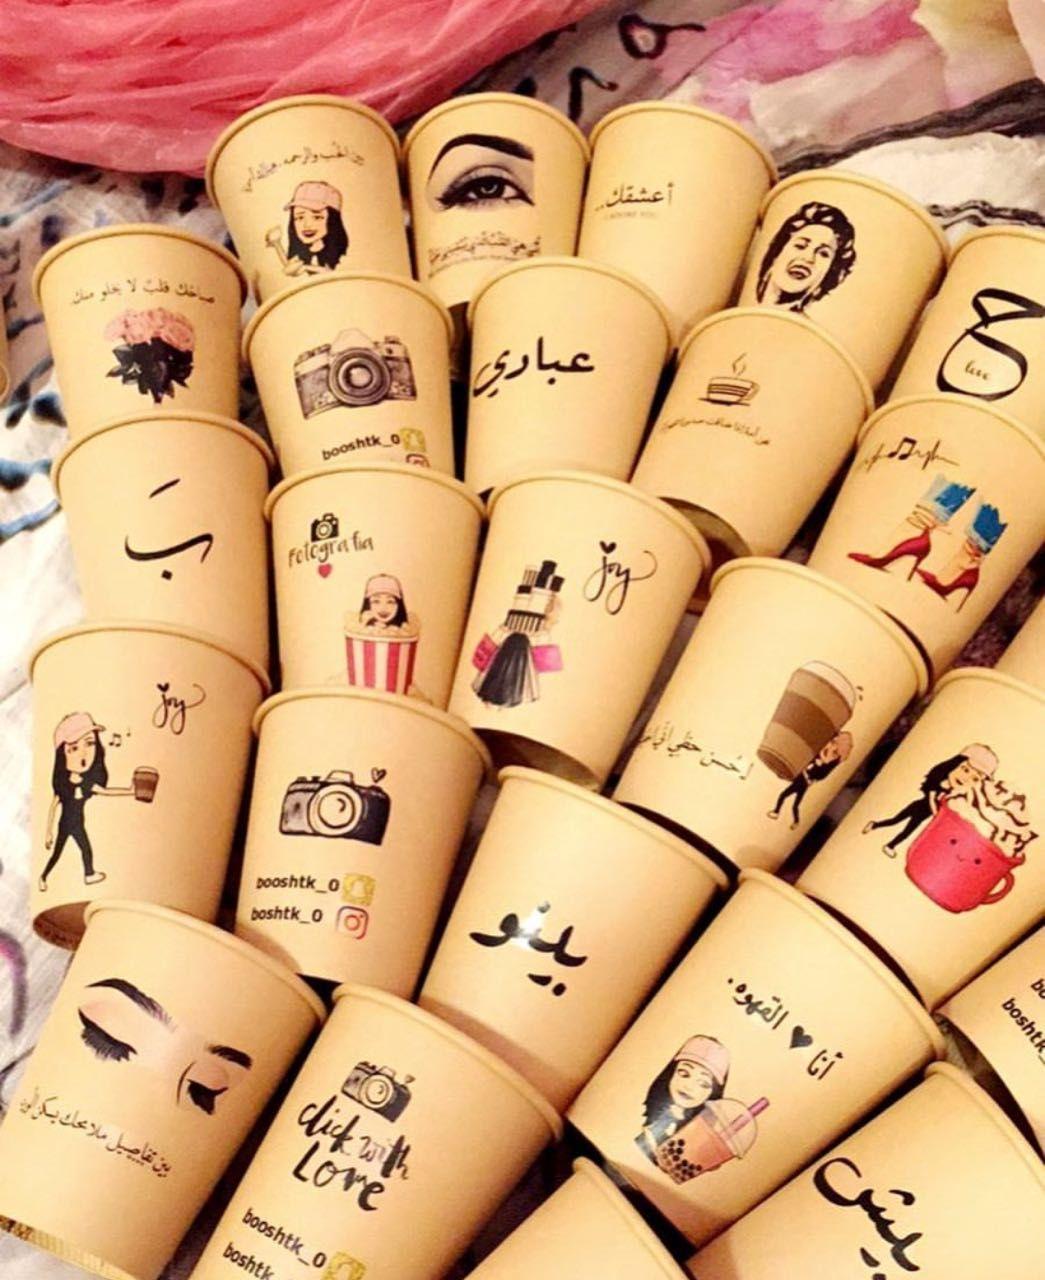 Inst Afkari2020 Starbucks Art Coffee Cup Art Coffee Cup Design